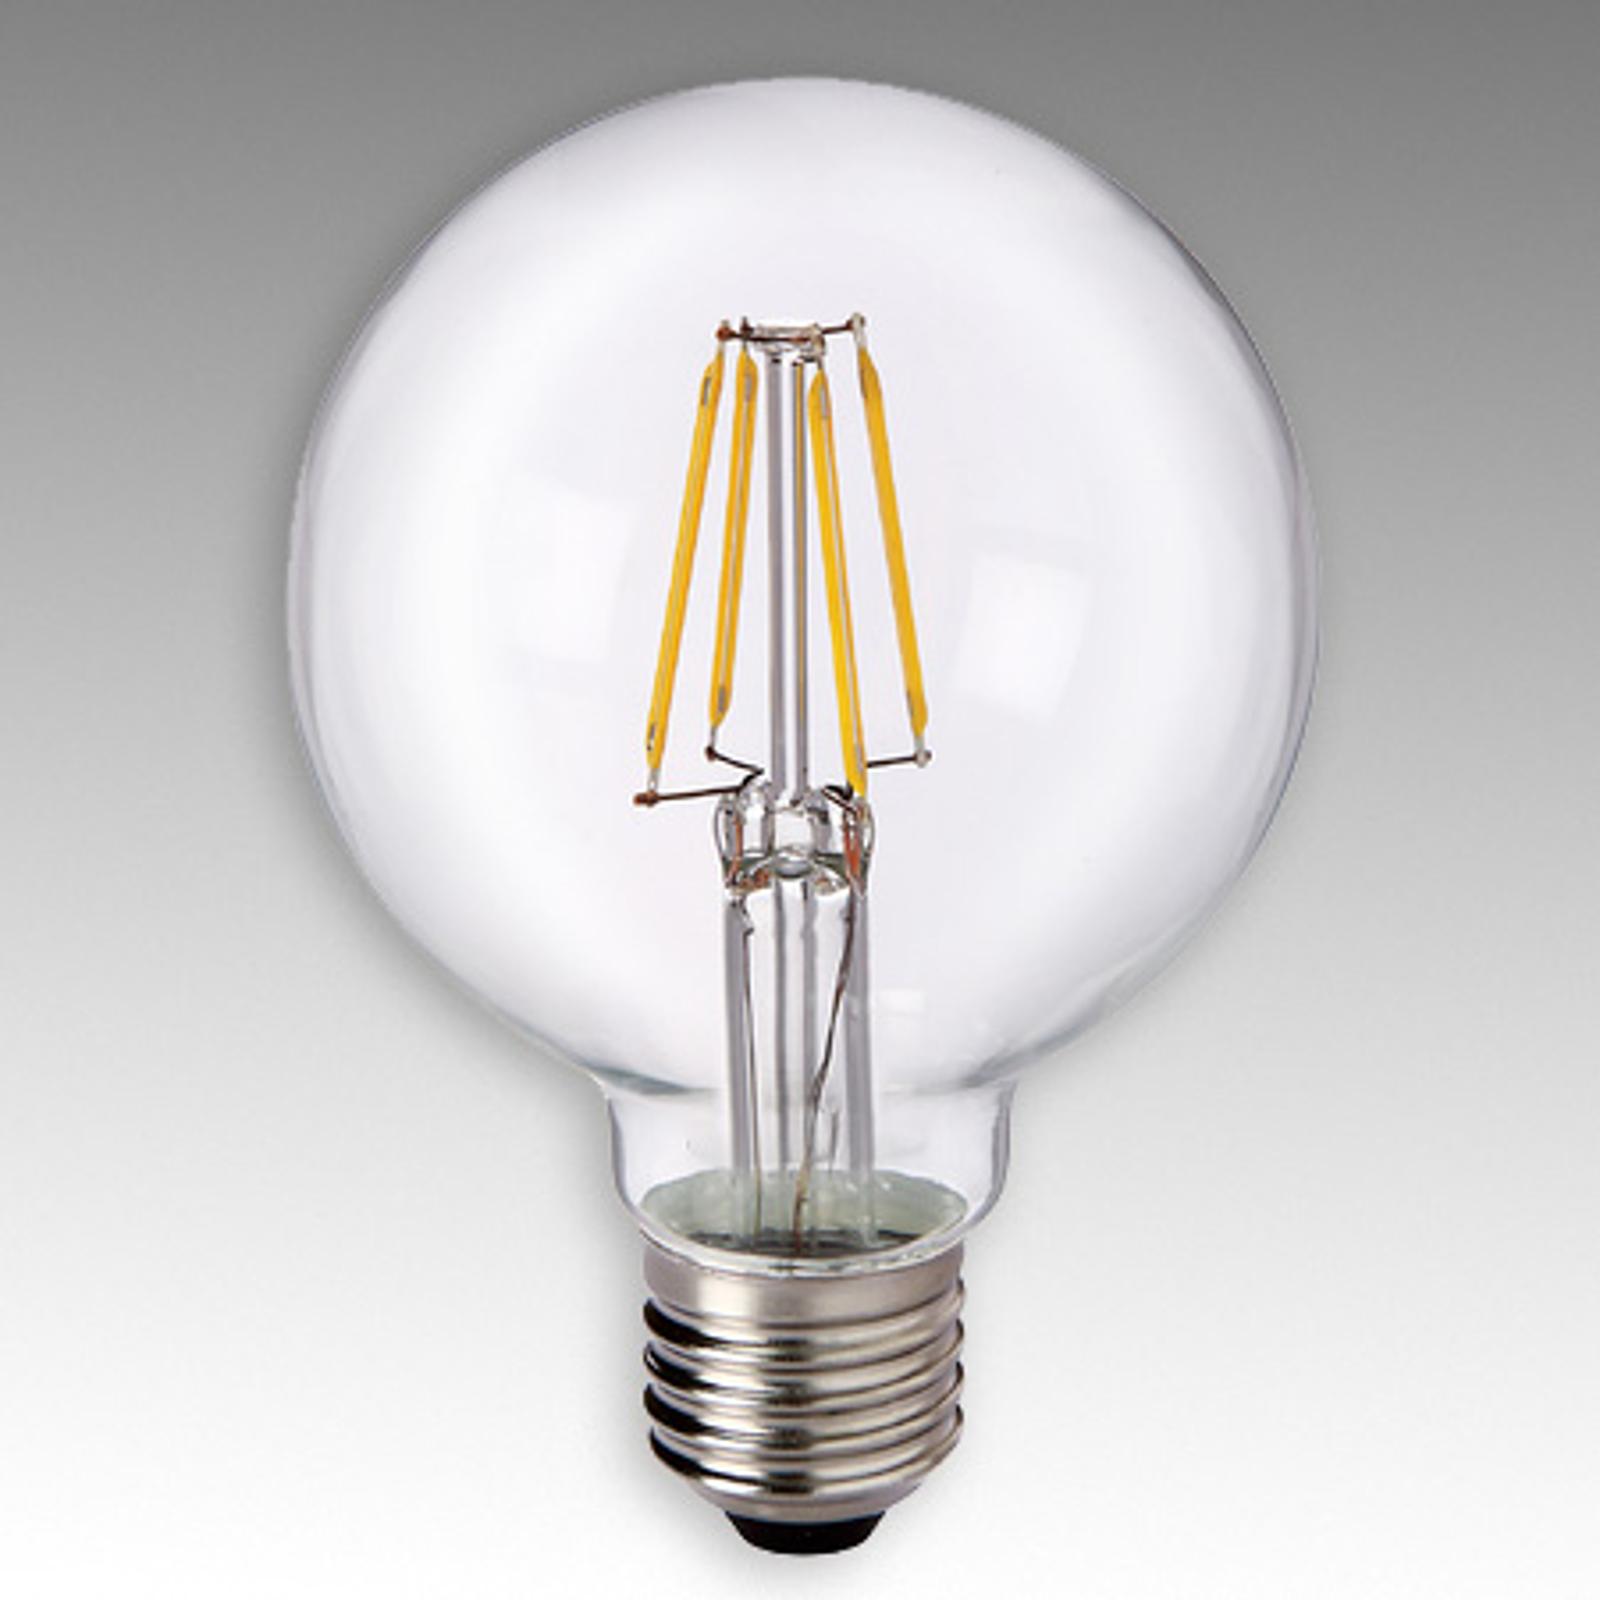 LED-Globelampe E27 4,5W 827 G80 Filament klar